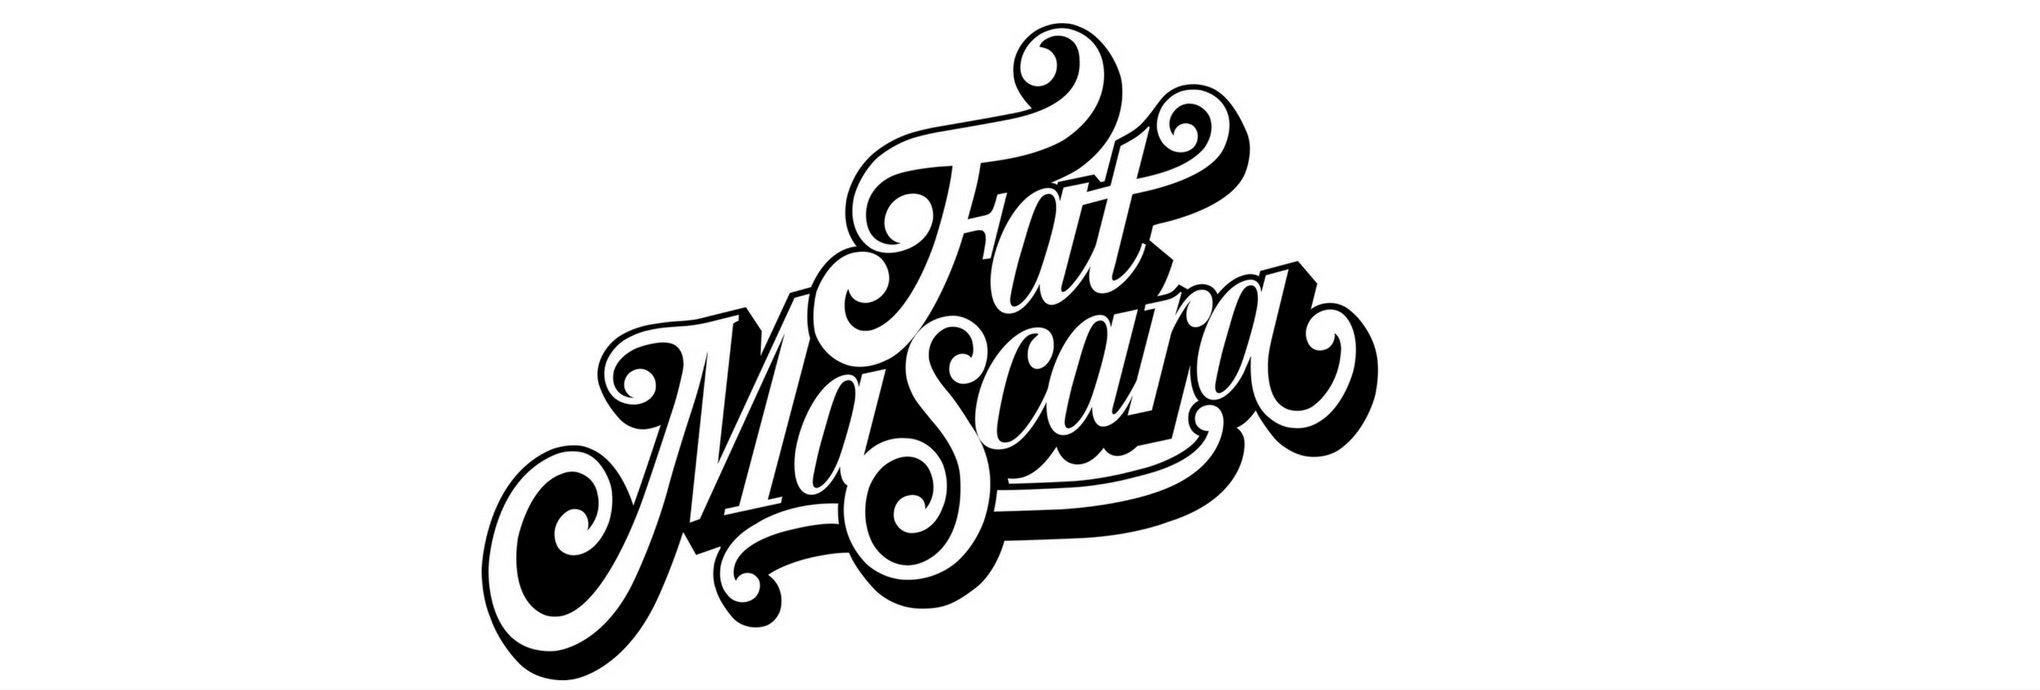 fatmascara_logo.jpg